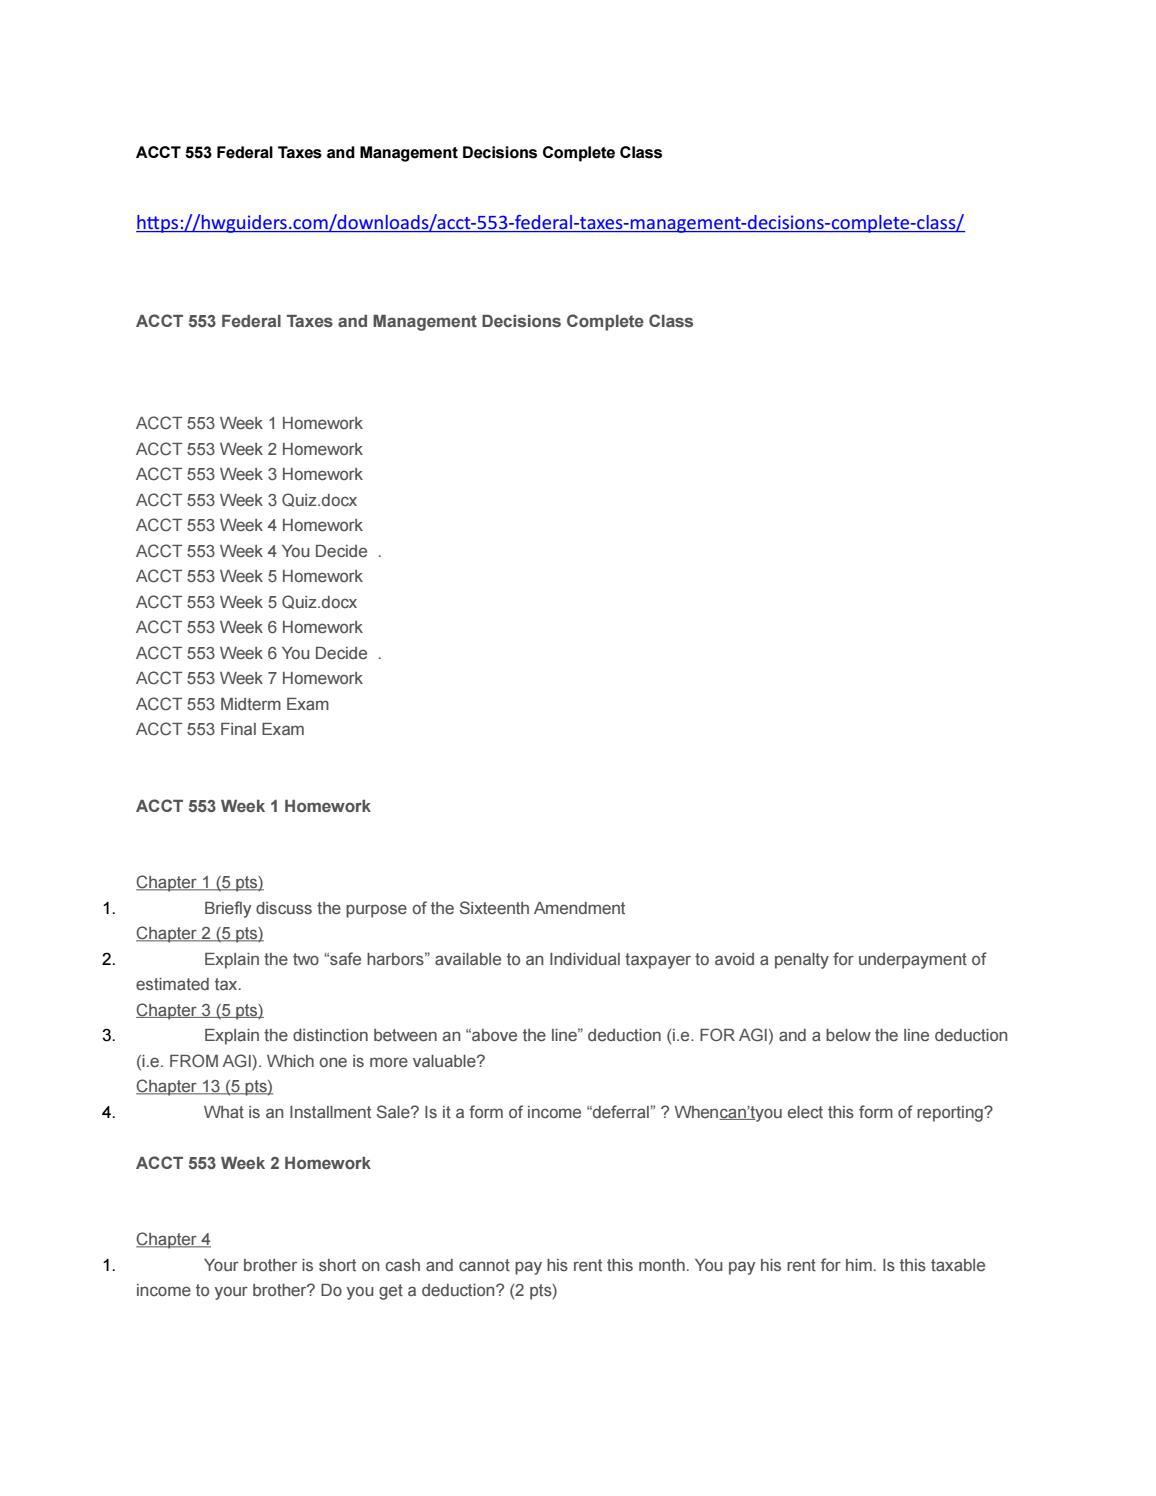 Acct 553 federal taxes final